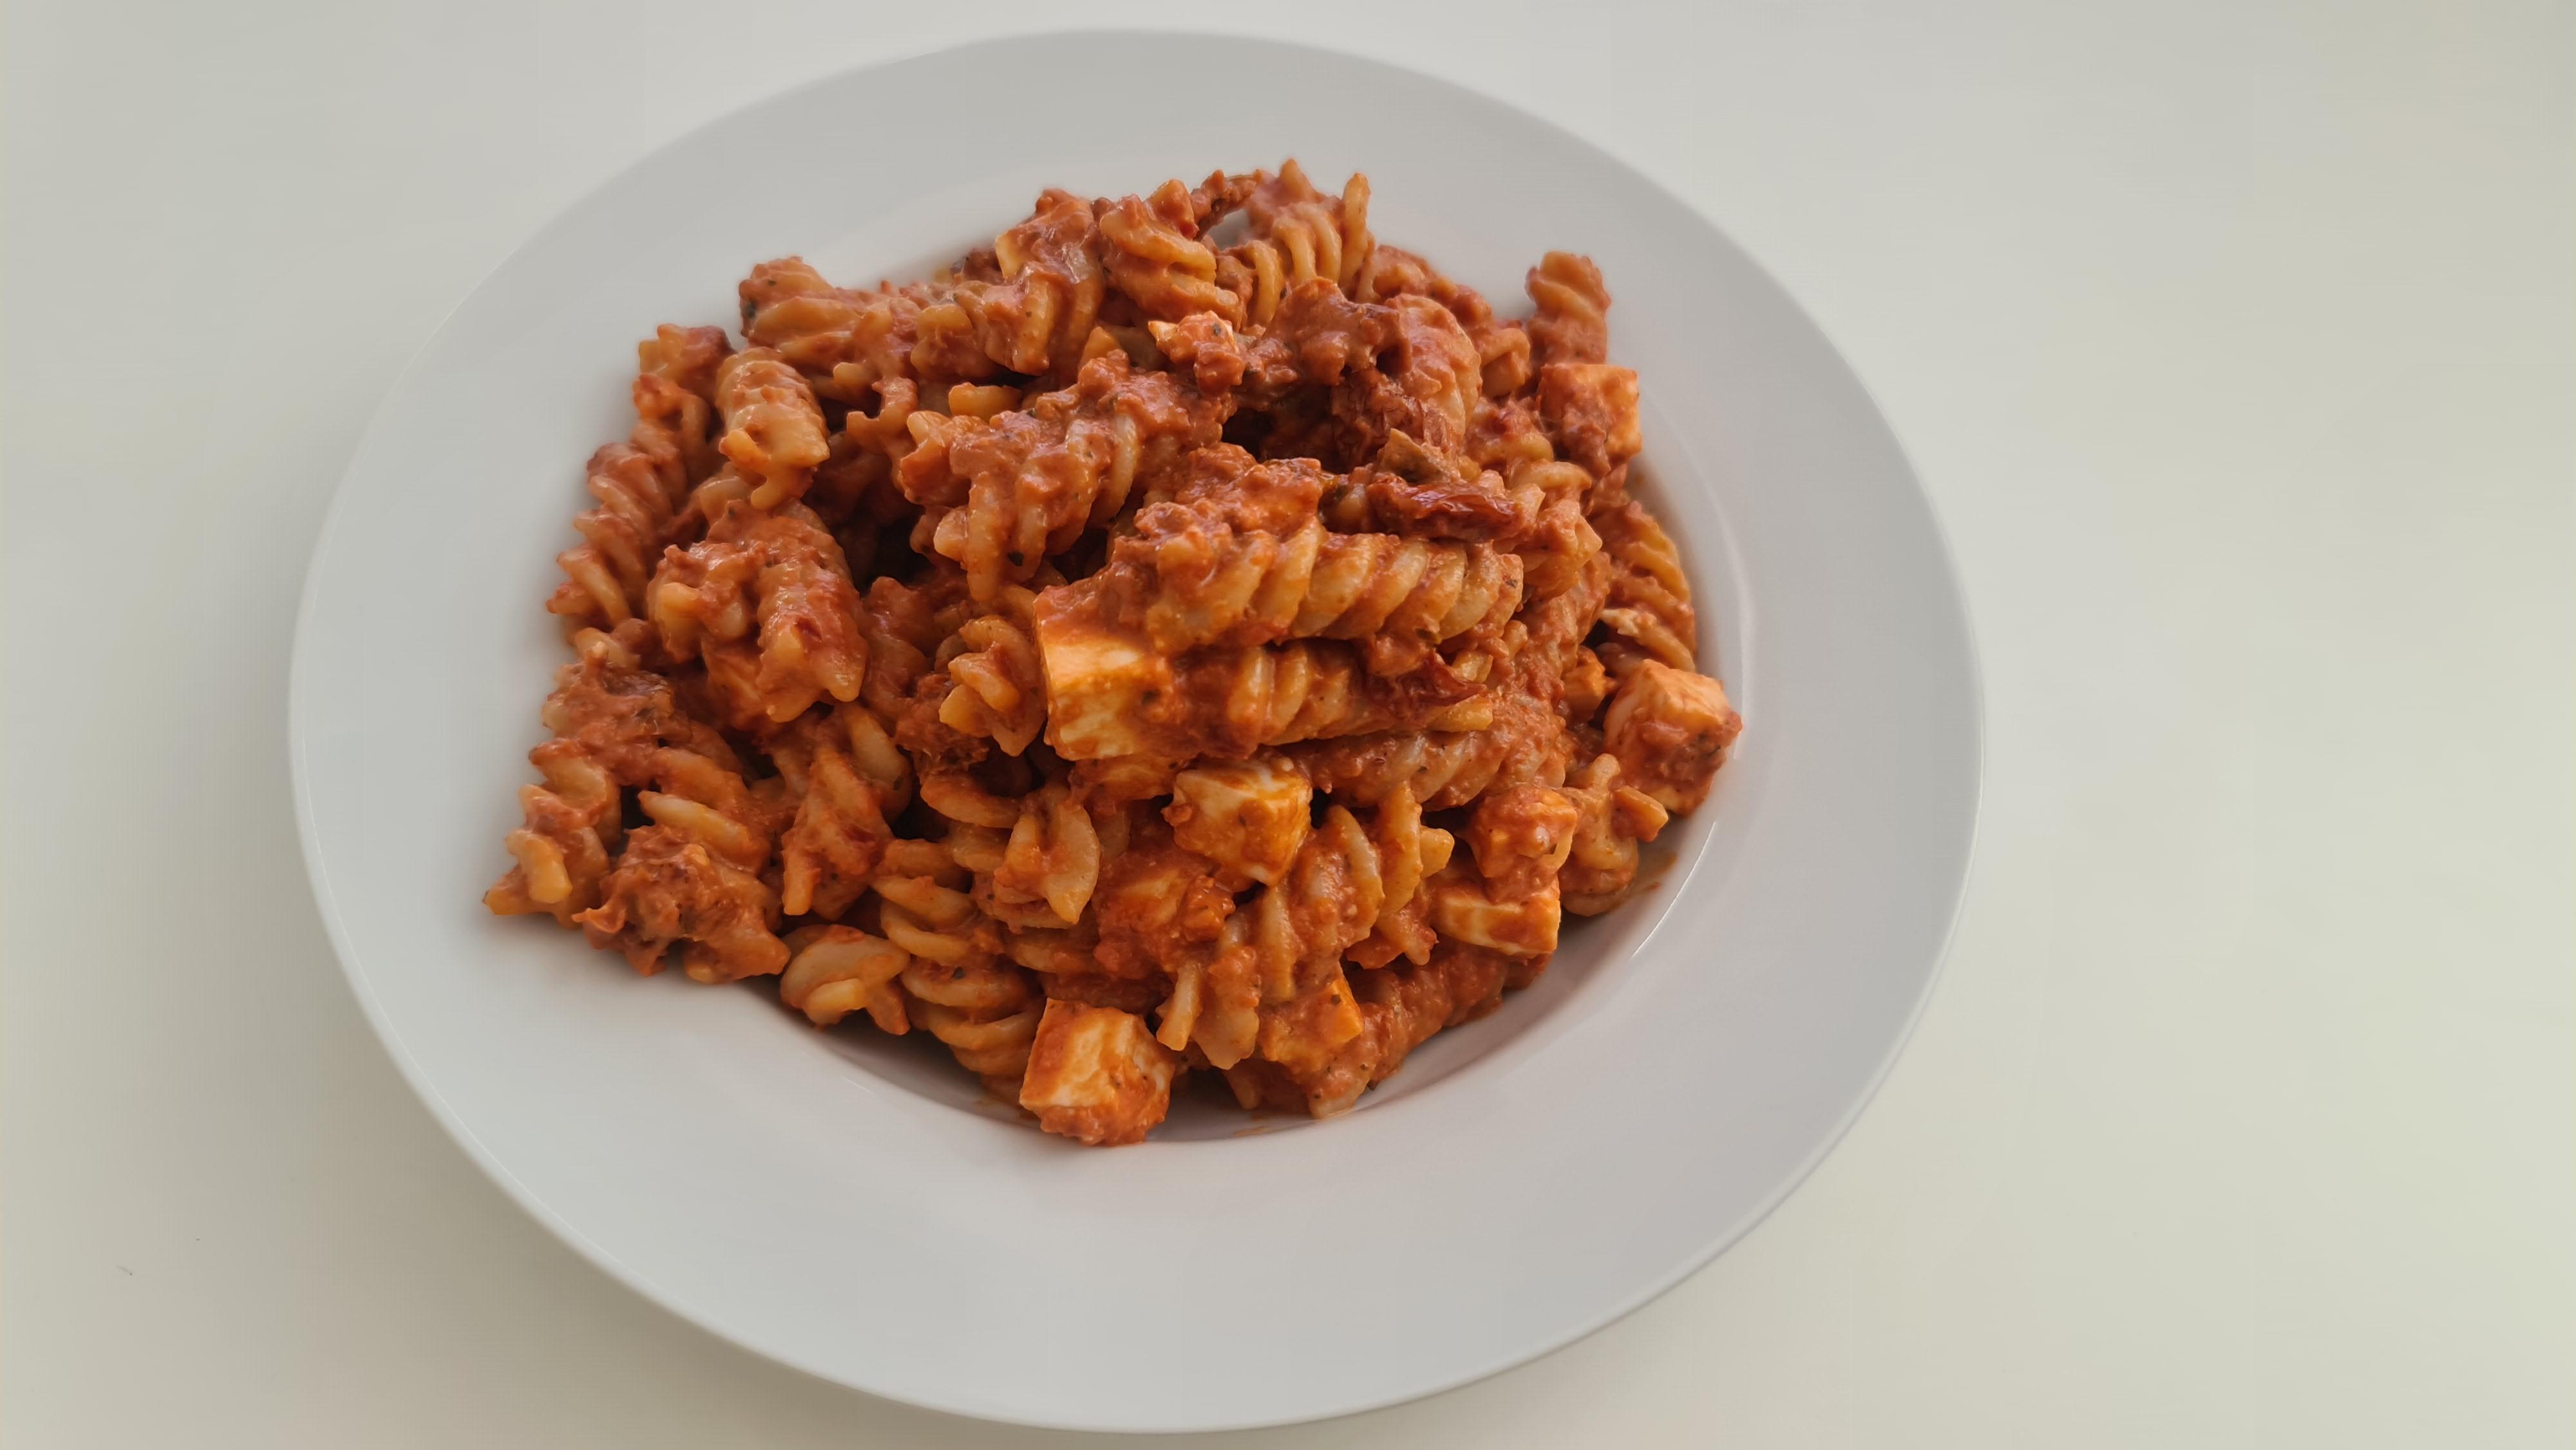 https://foodloader.net/Holz_2020-05-14_Fusilli_Pomodori_Secchi.jpg